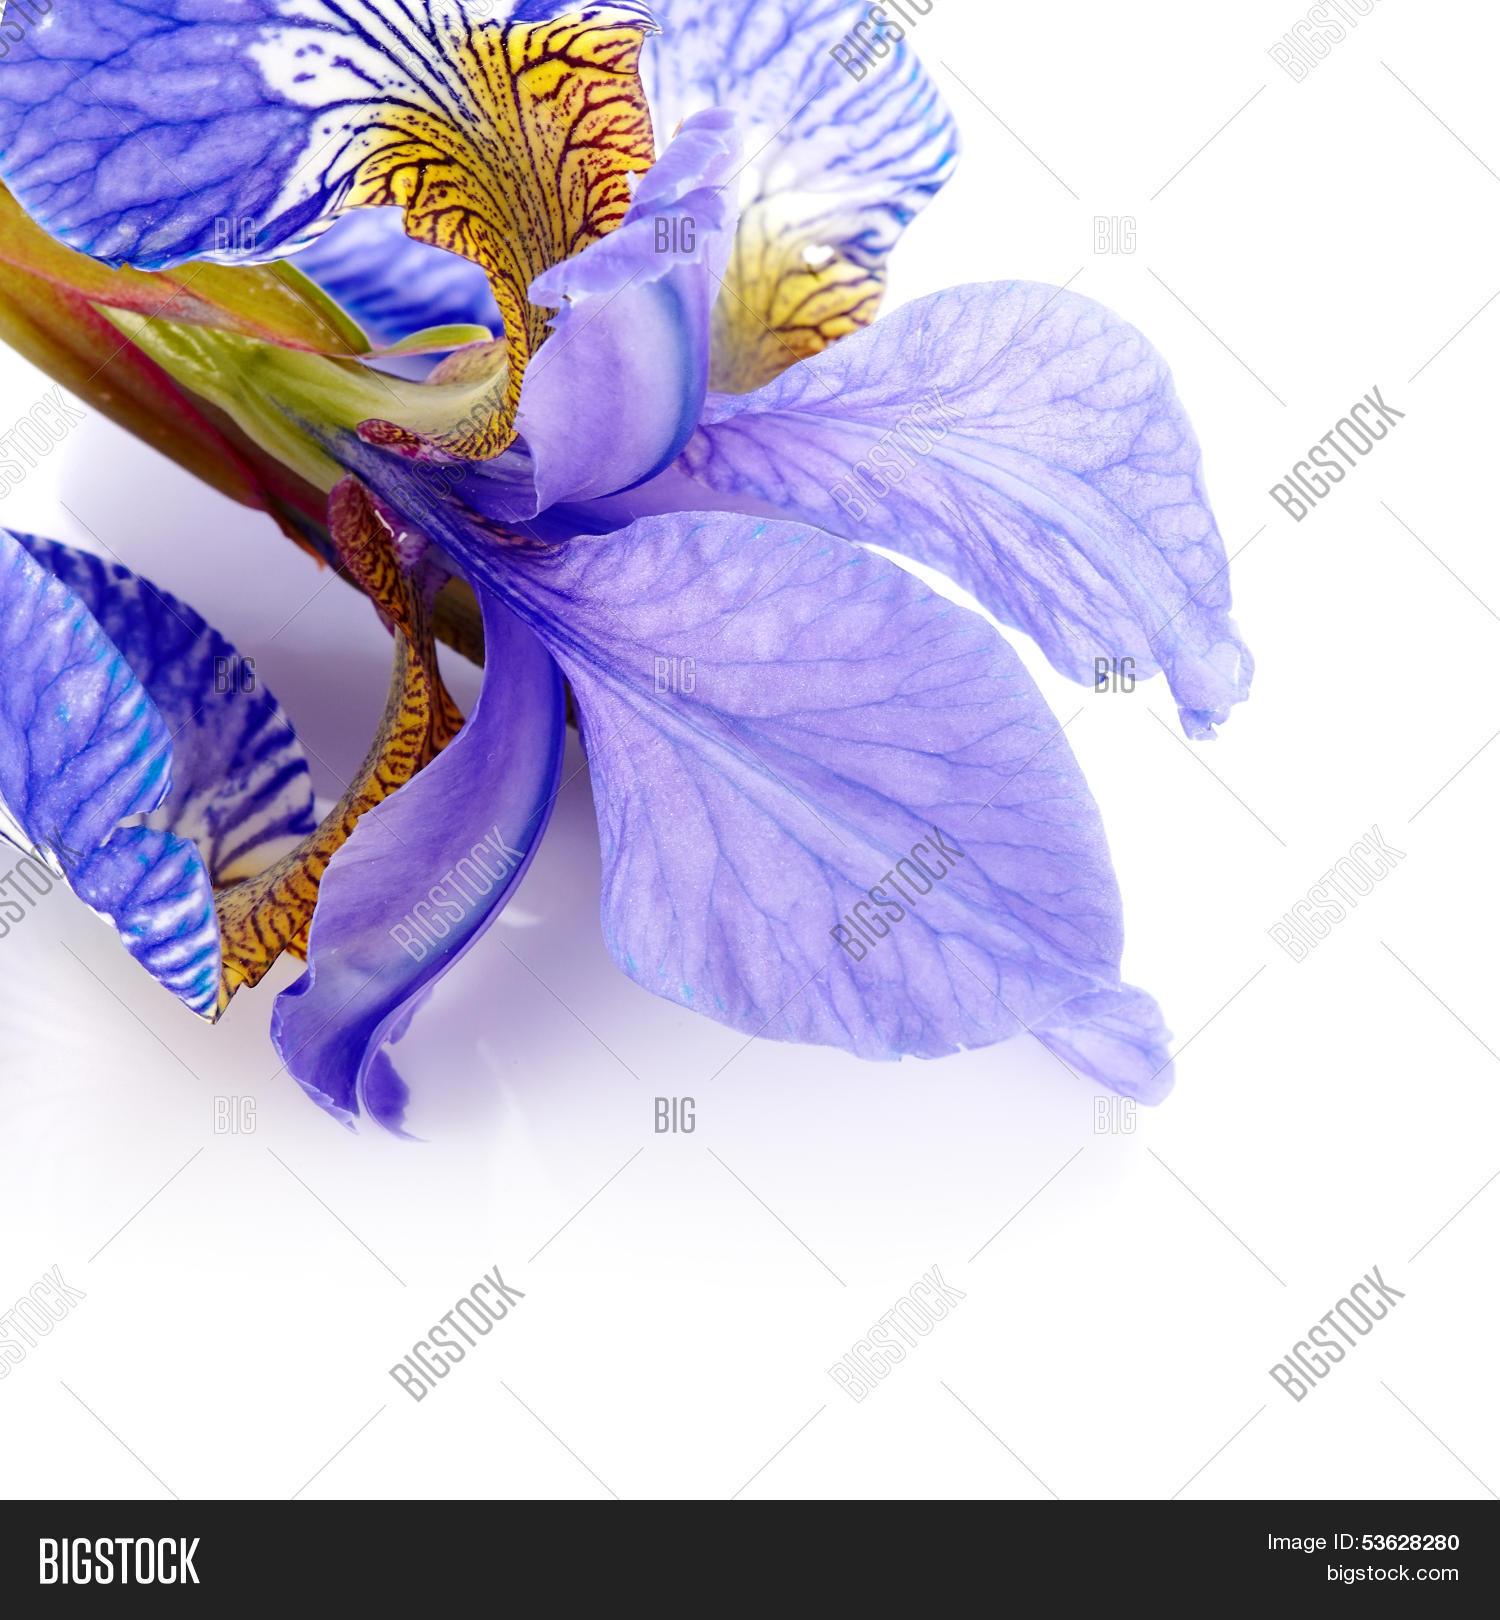 Petals Flower Iris Image Photo Free Trial Bigstock